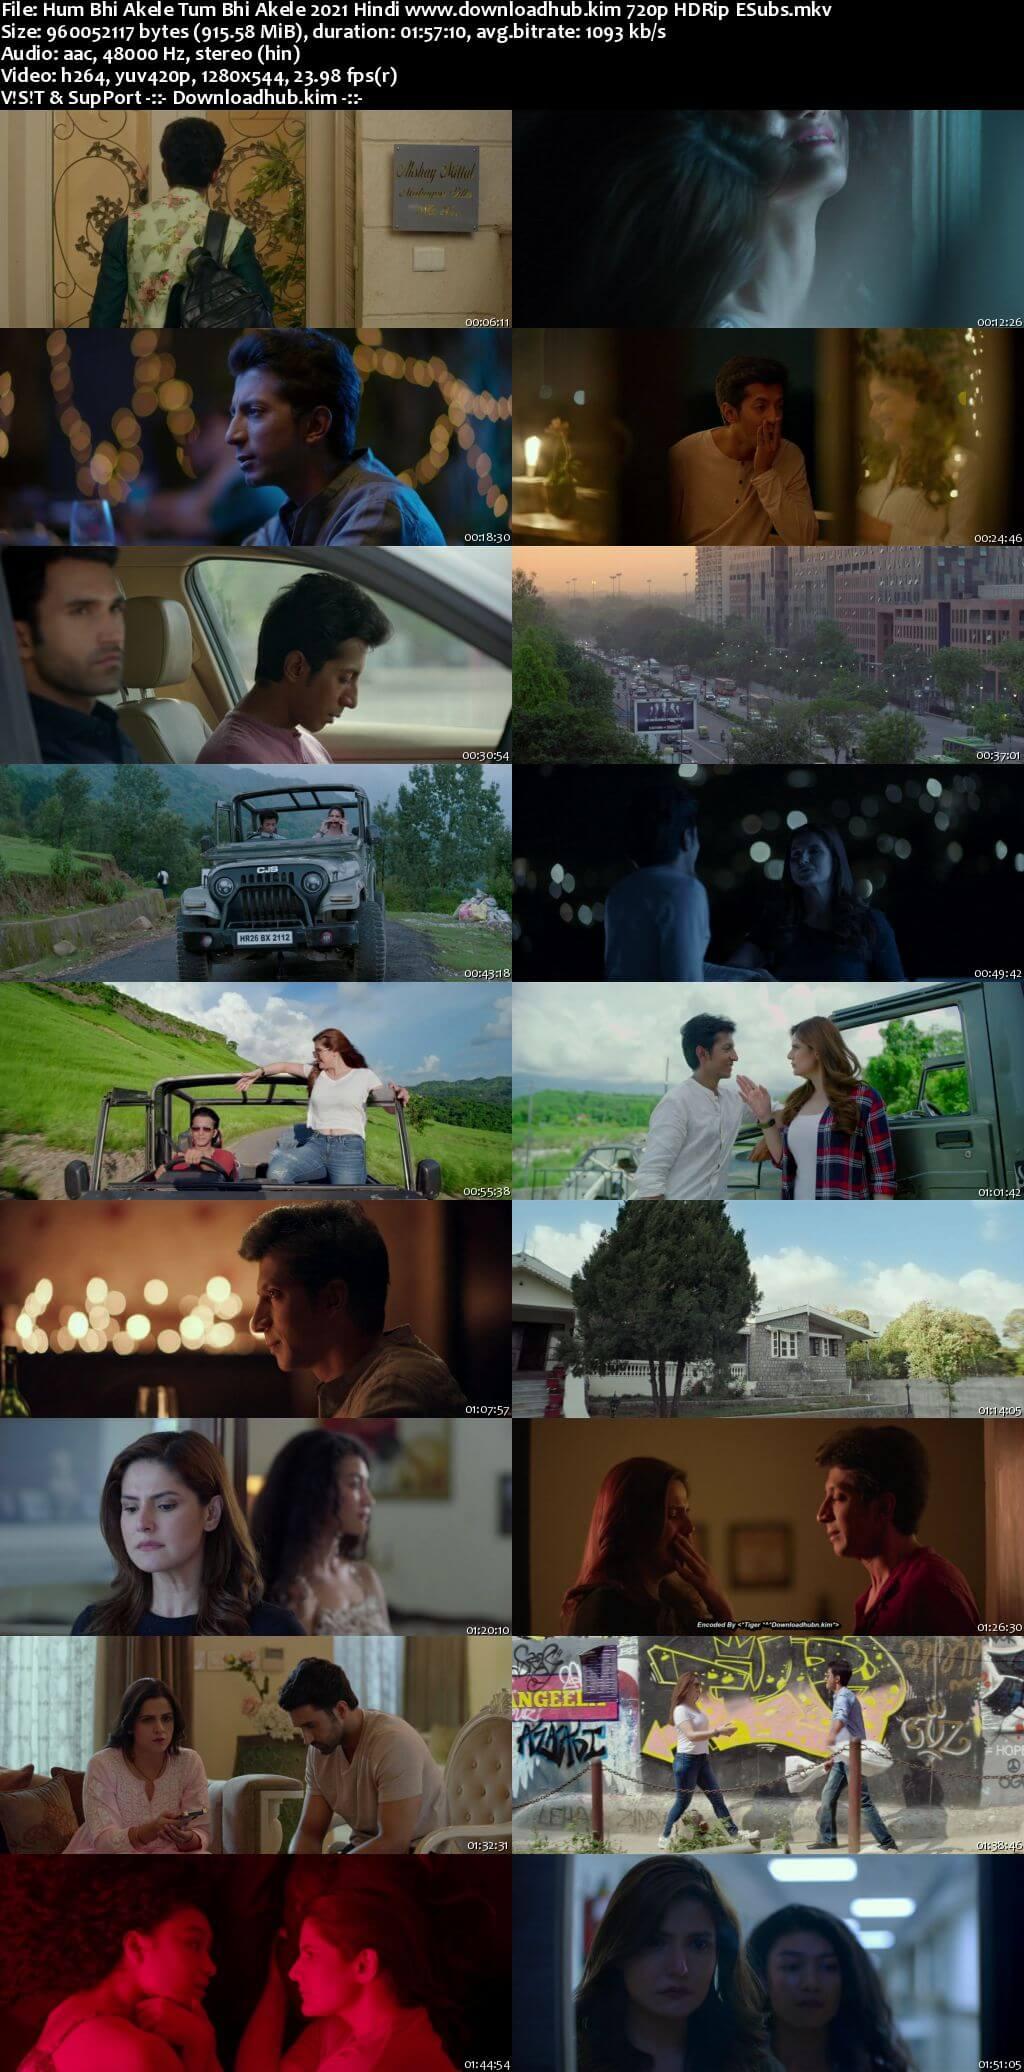 Hum Bhi Akele Tum Bhi Akele 2021 Hindi 720p HDRip ESubs